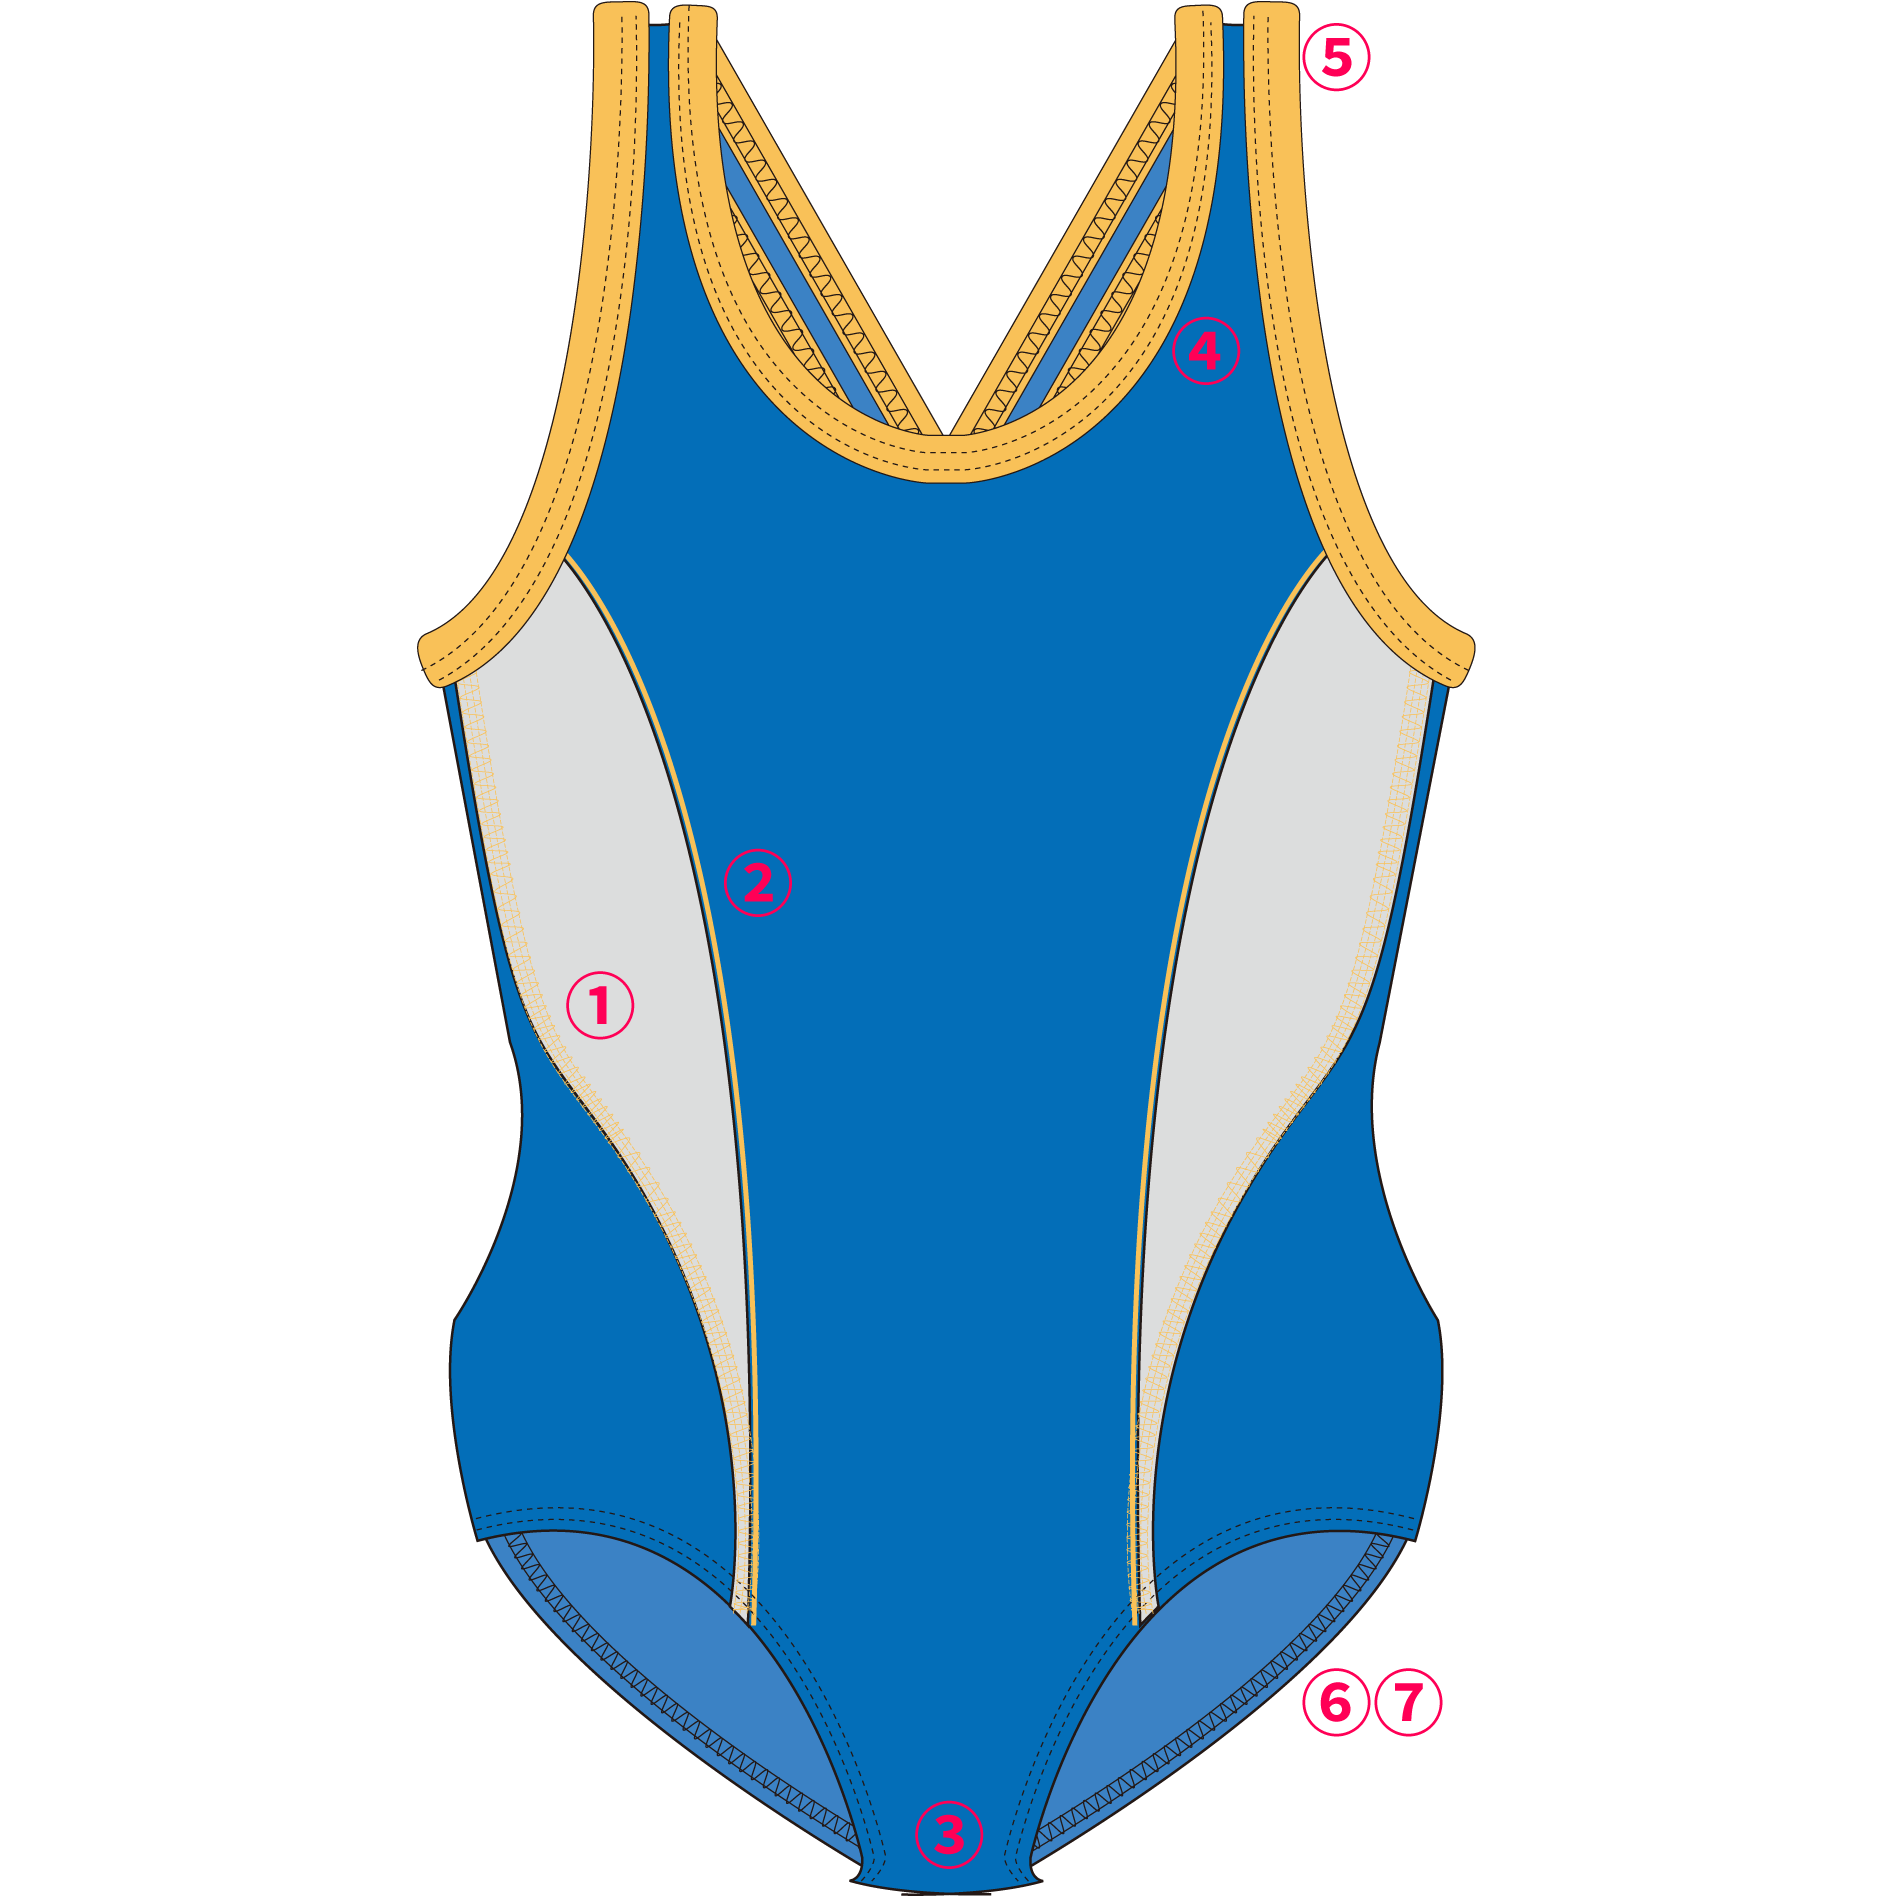 Garment_Swimwear_NumFull@3x-8.png